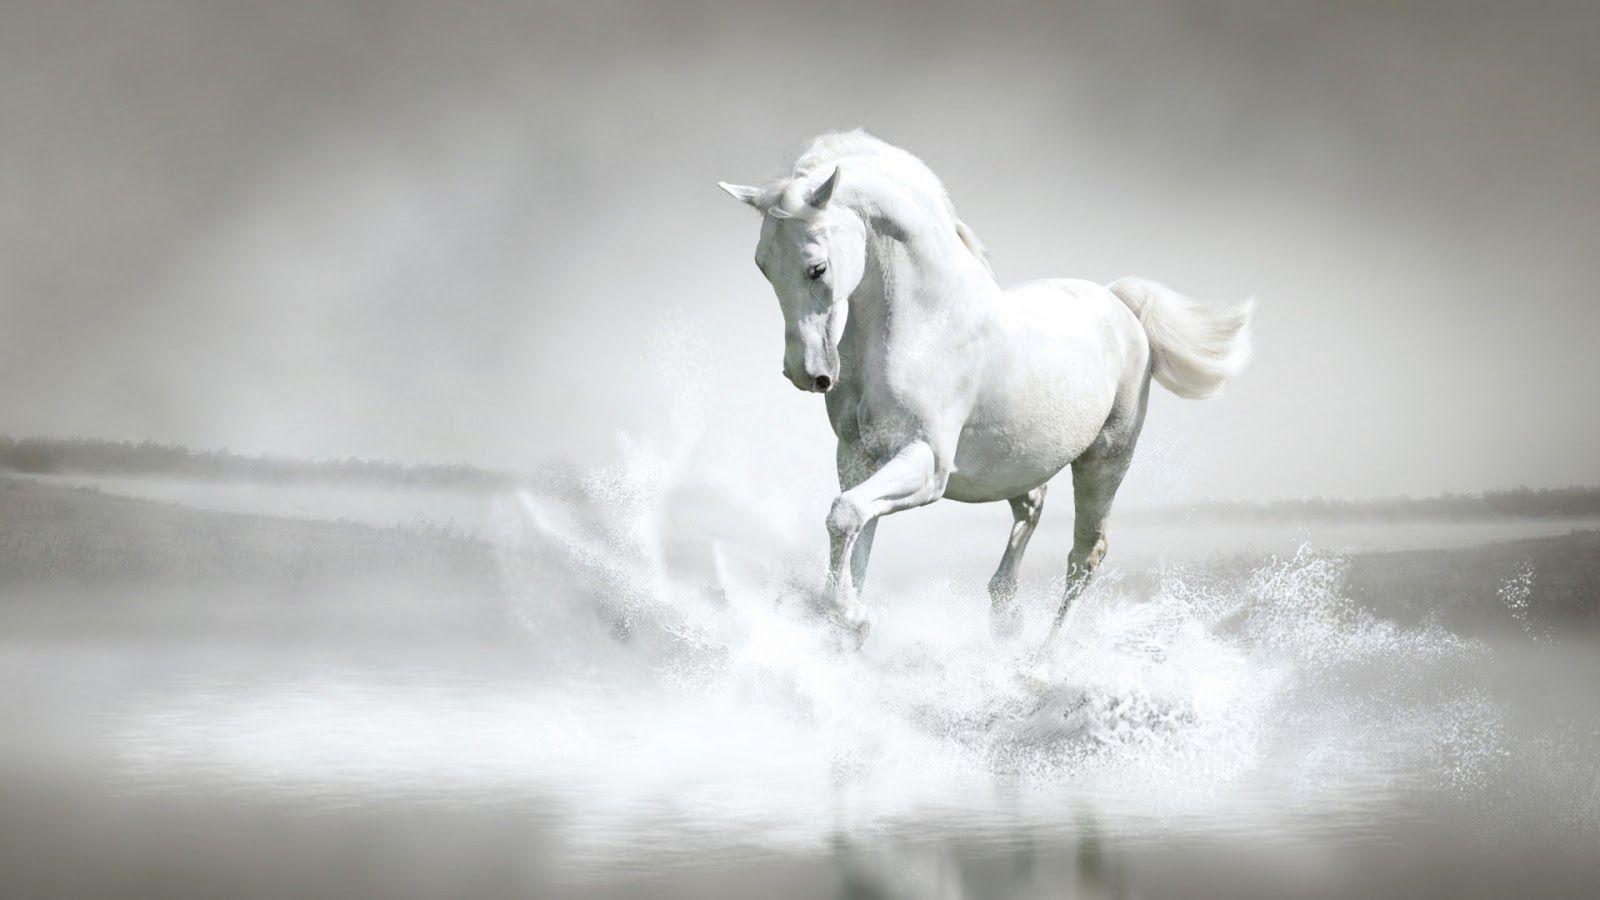 caballos y famosos - Buscar con Google